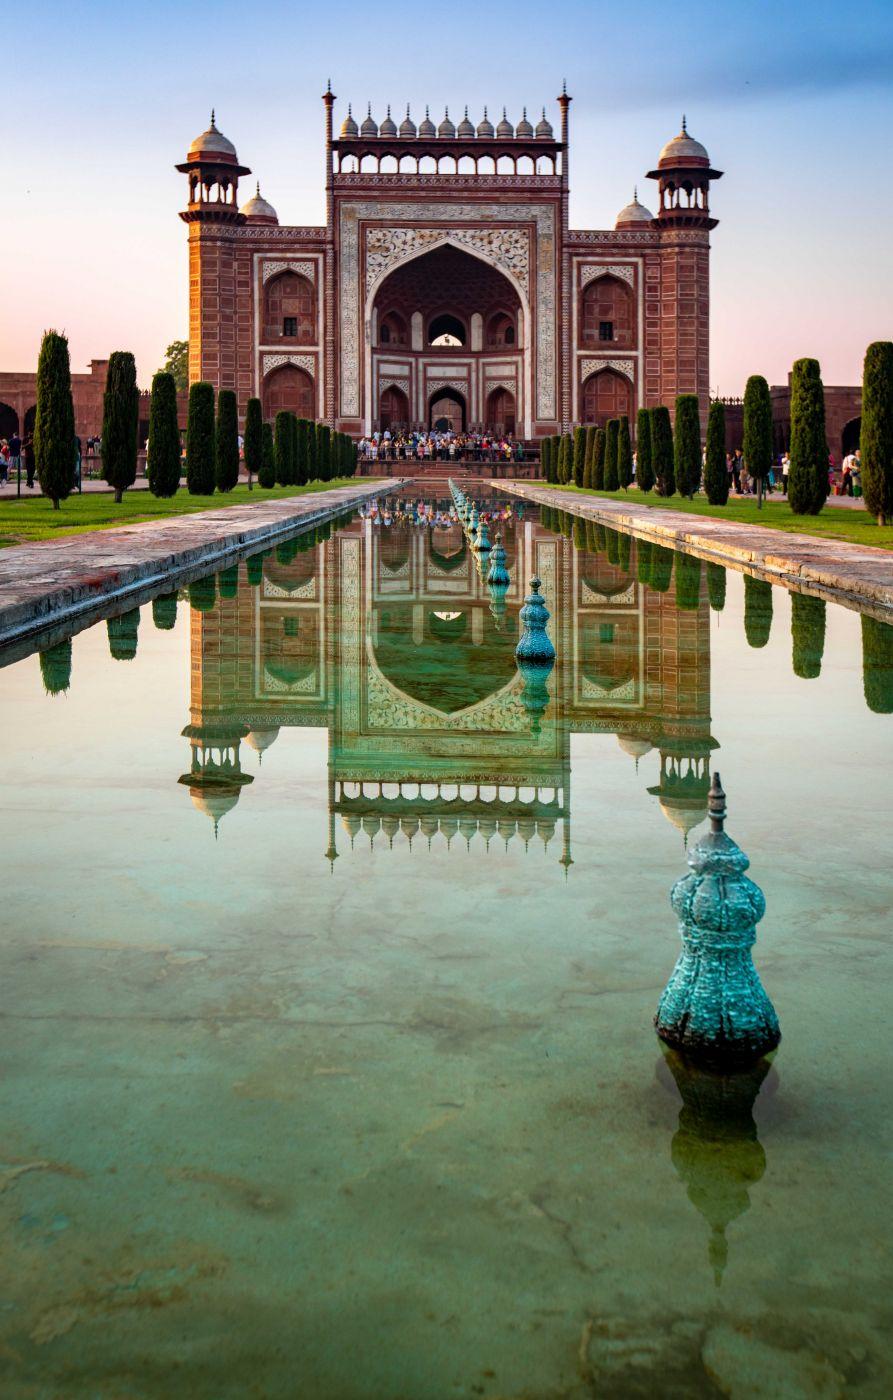 The Taj Mahal Gateway, Agra, India